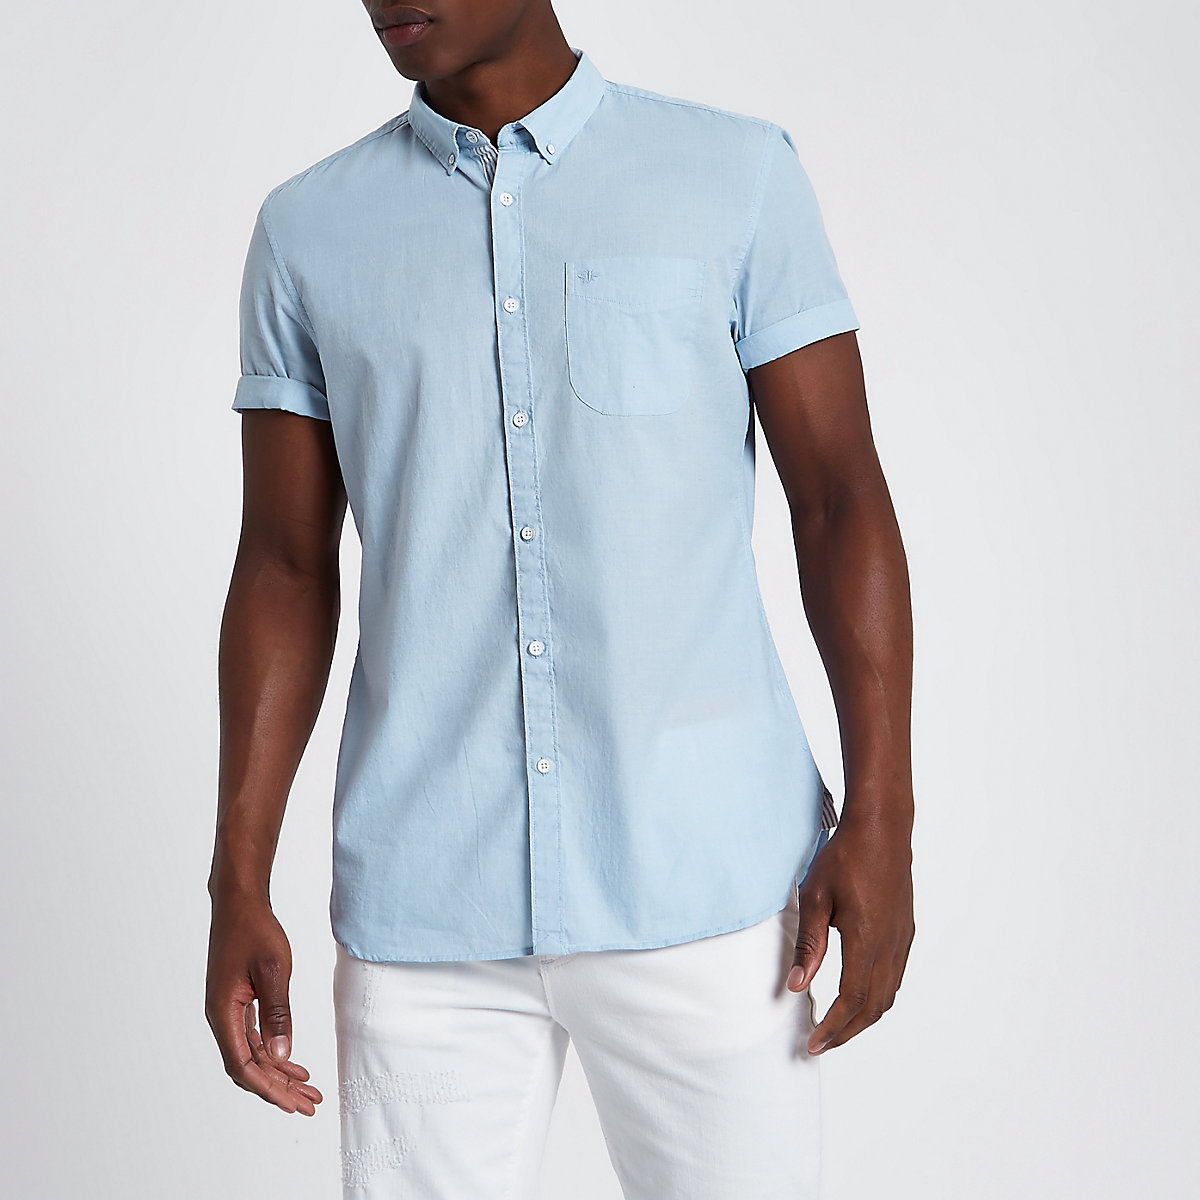 Light blue slim fit button-down shirt